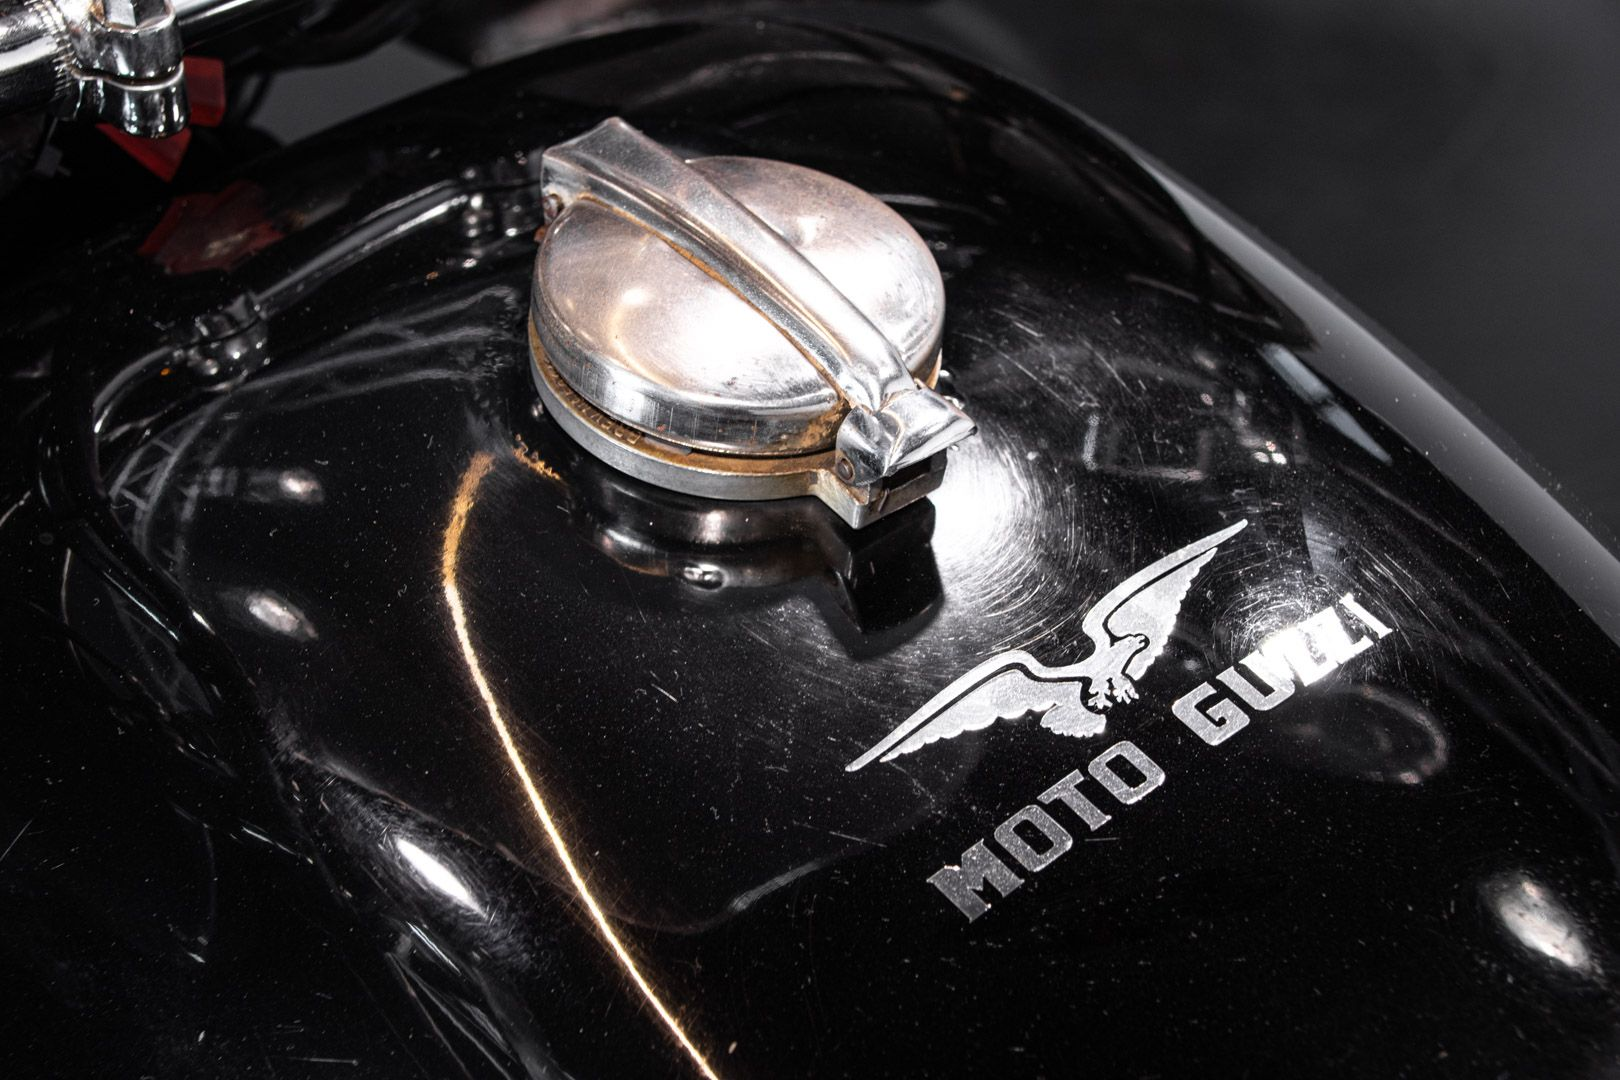 1969 Moto Guzzi V7 Special 81489